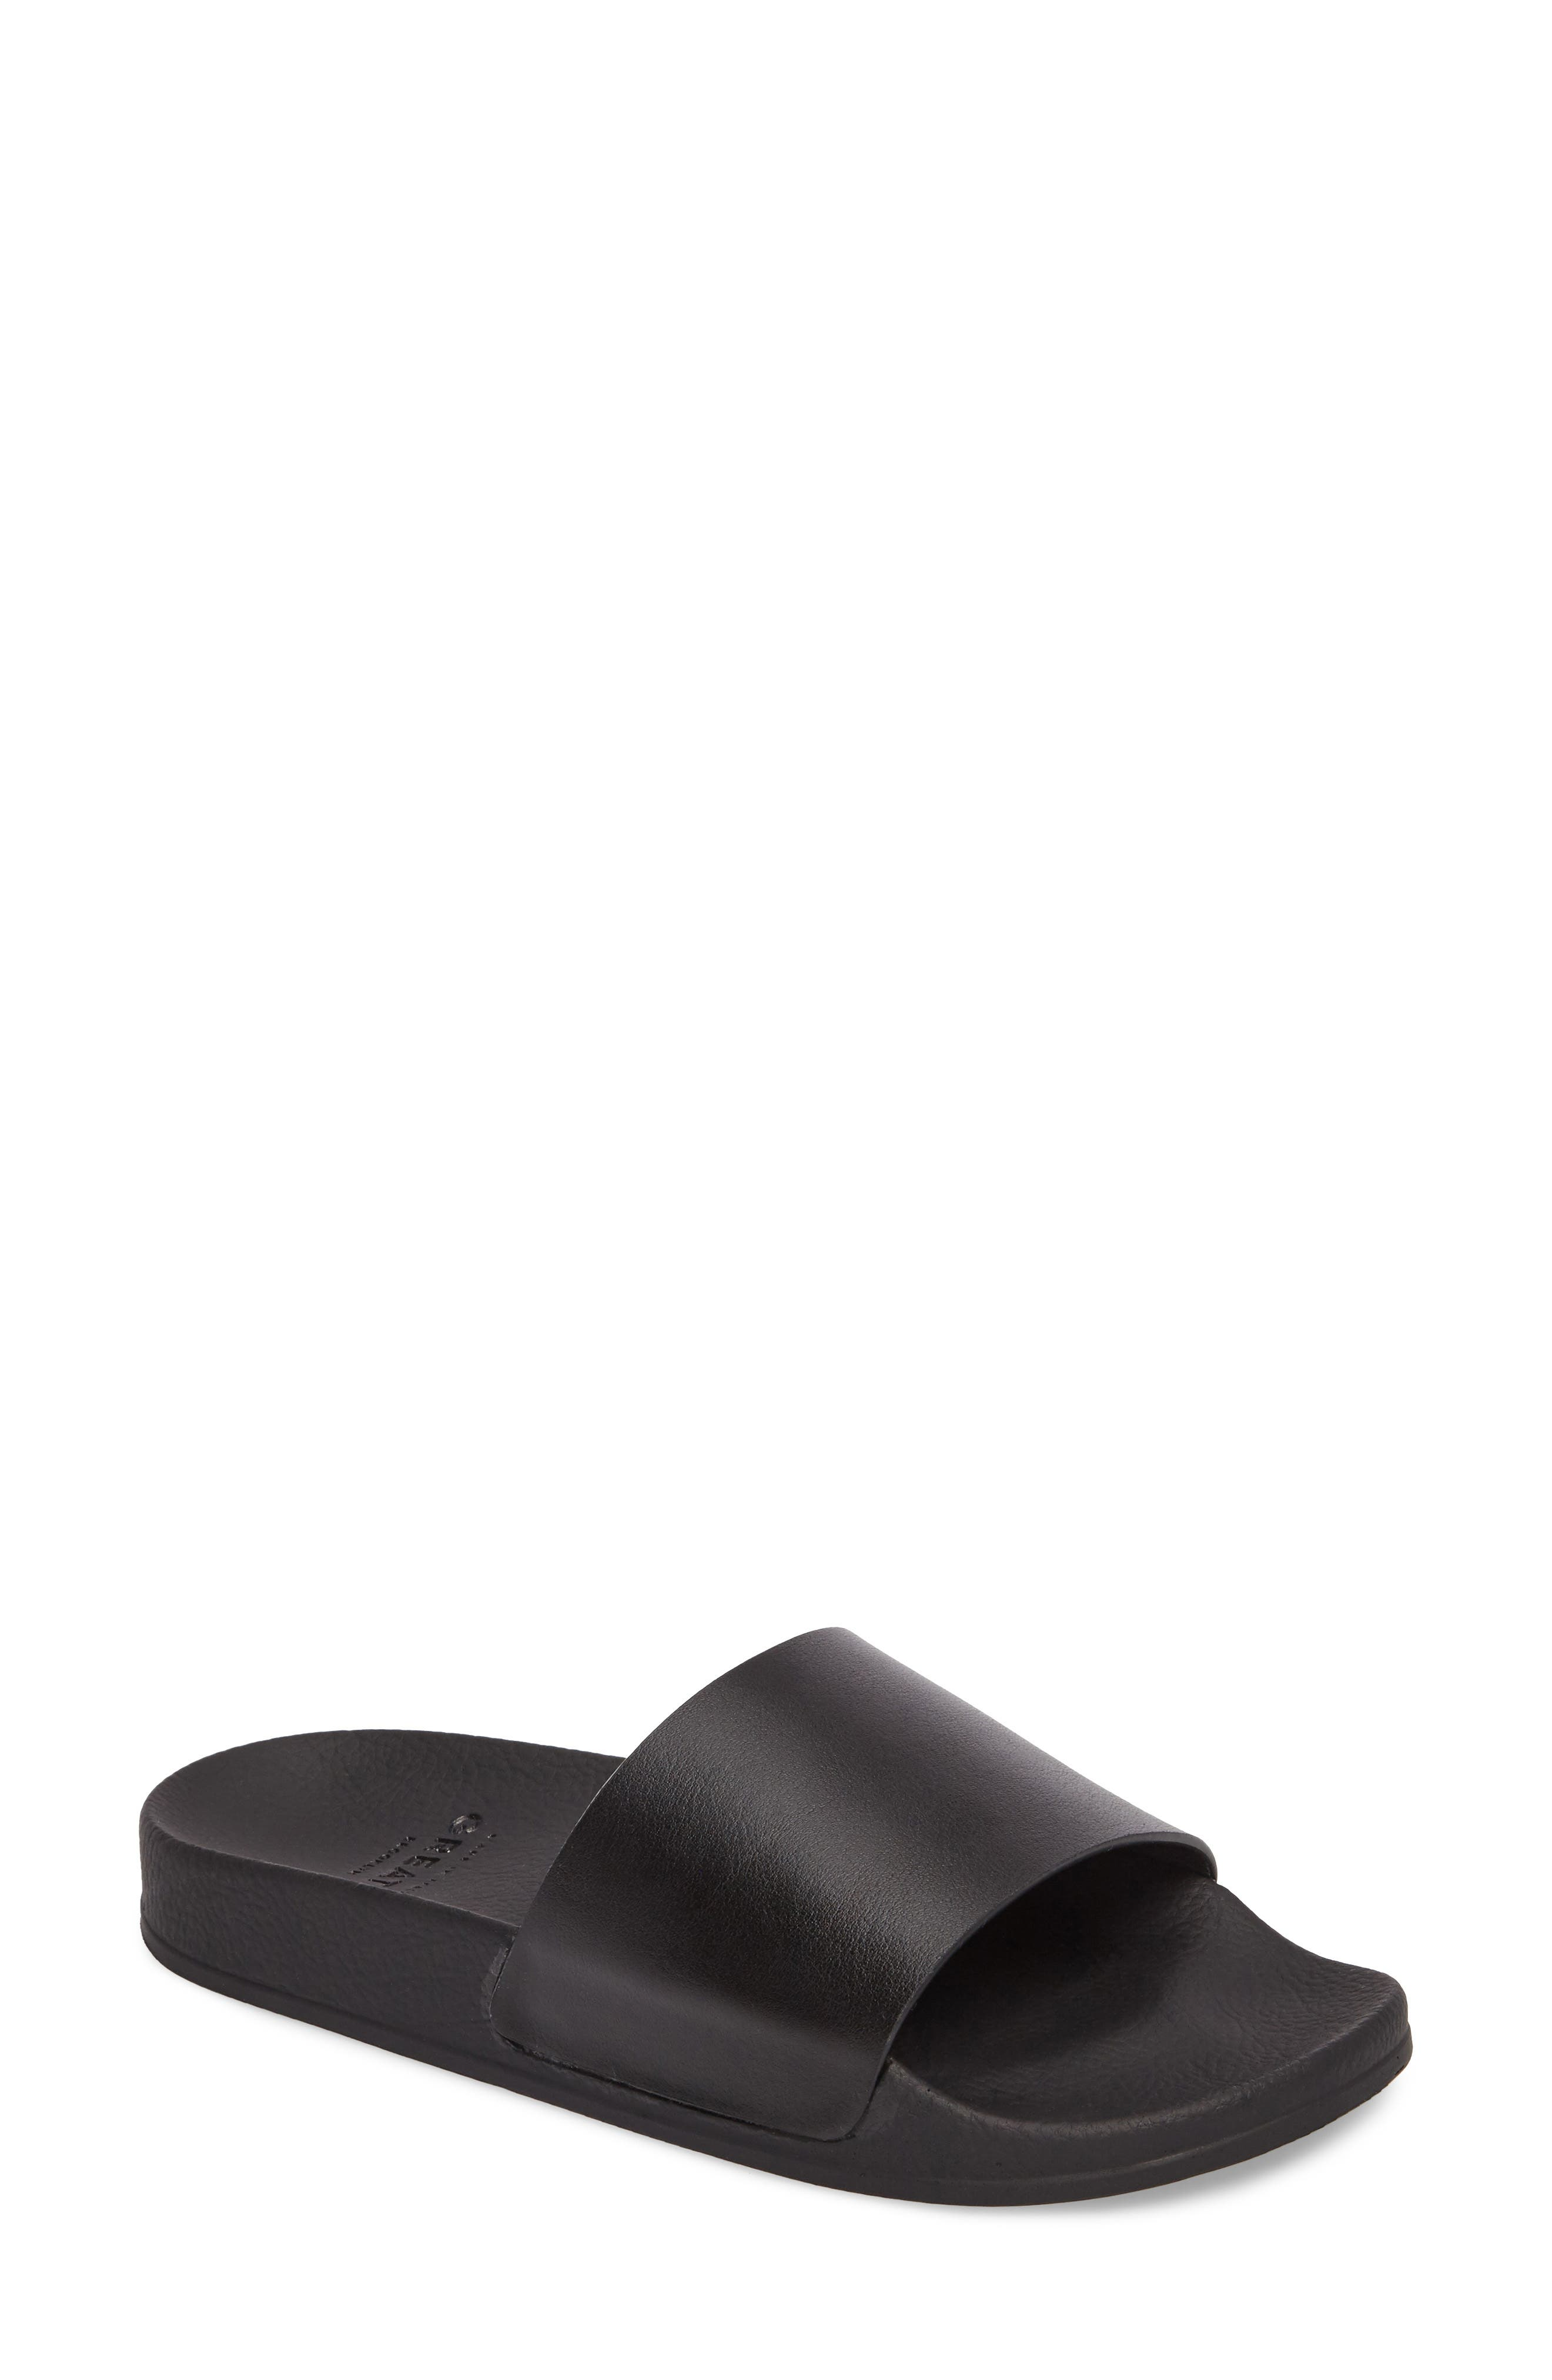 Amalfi Slide Sandal,                         Main,                         color, 001